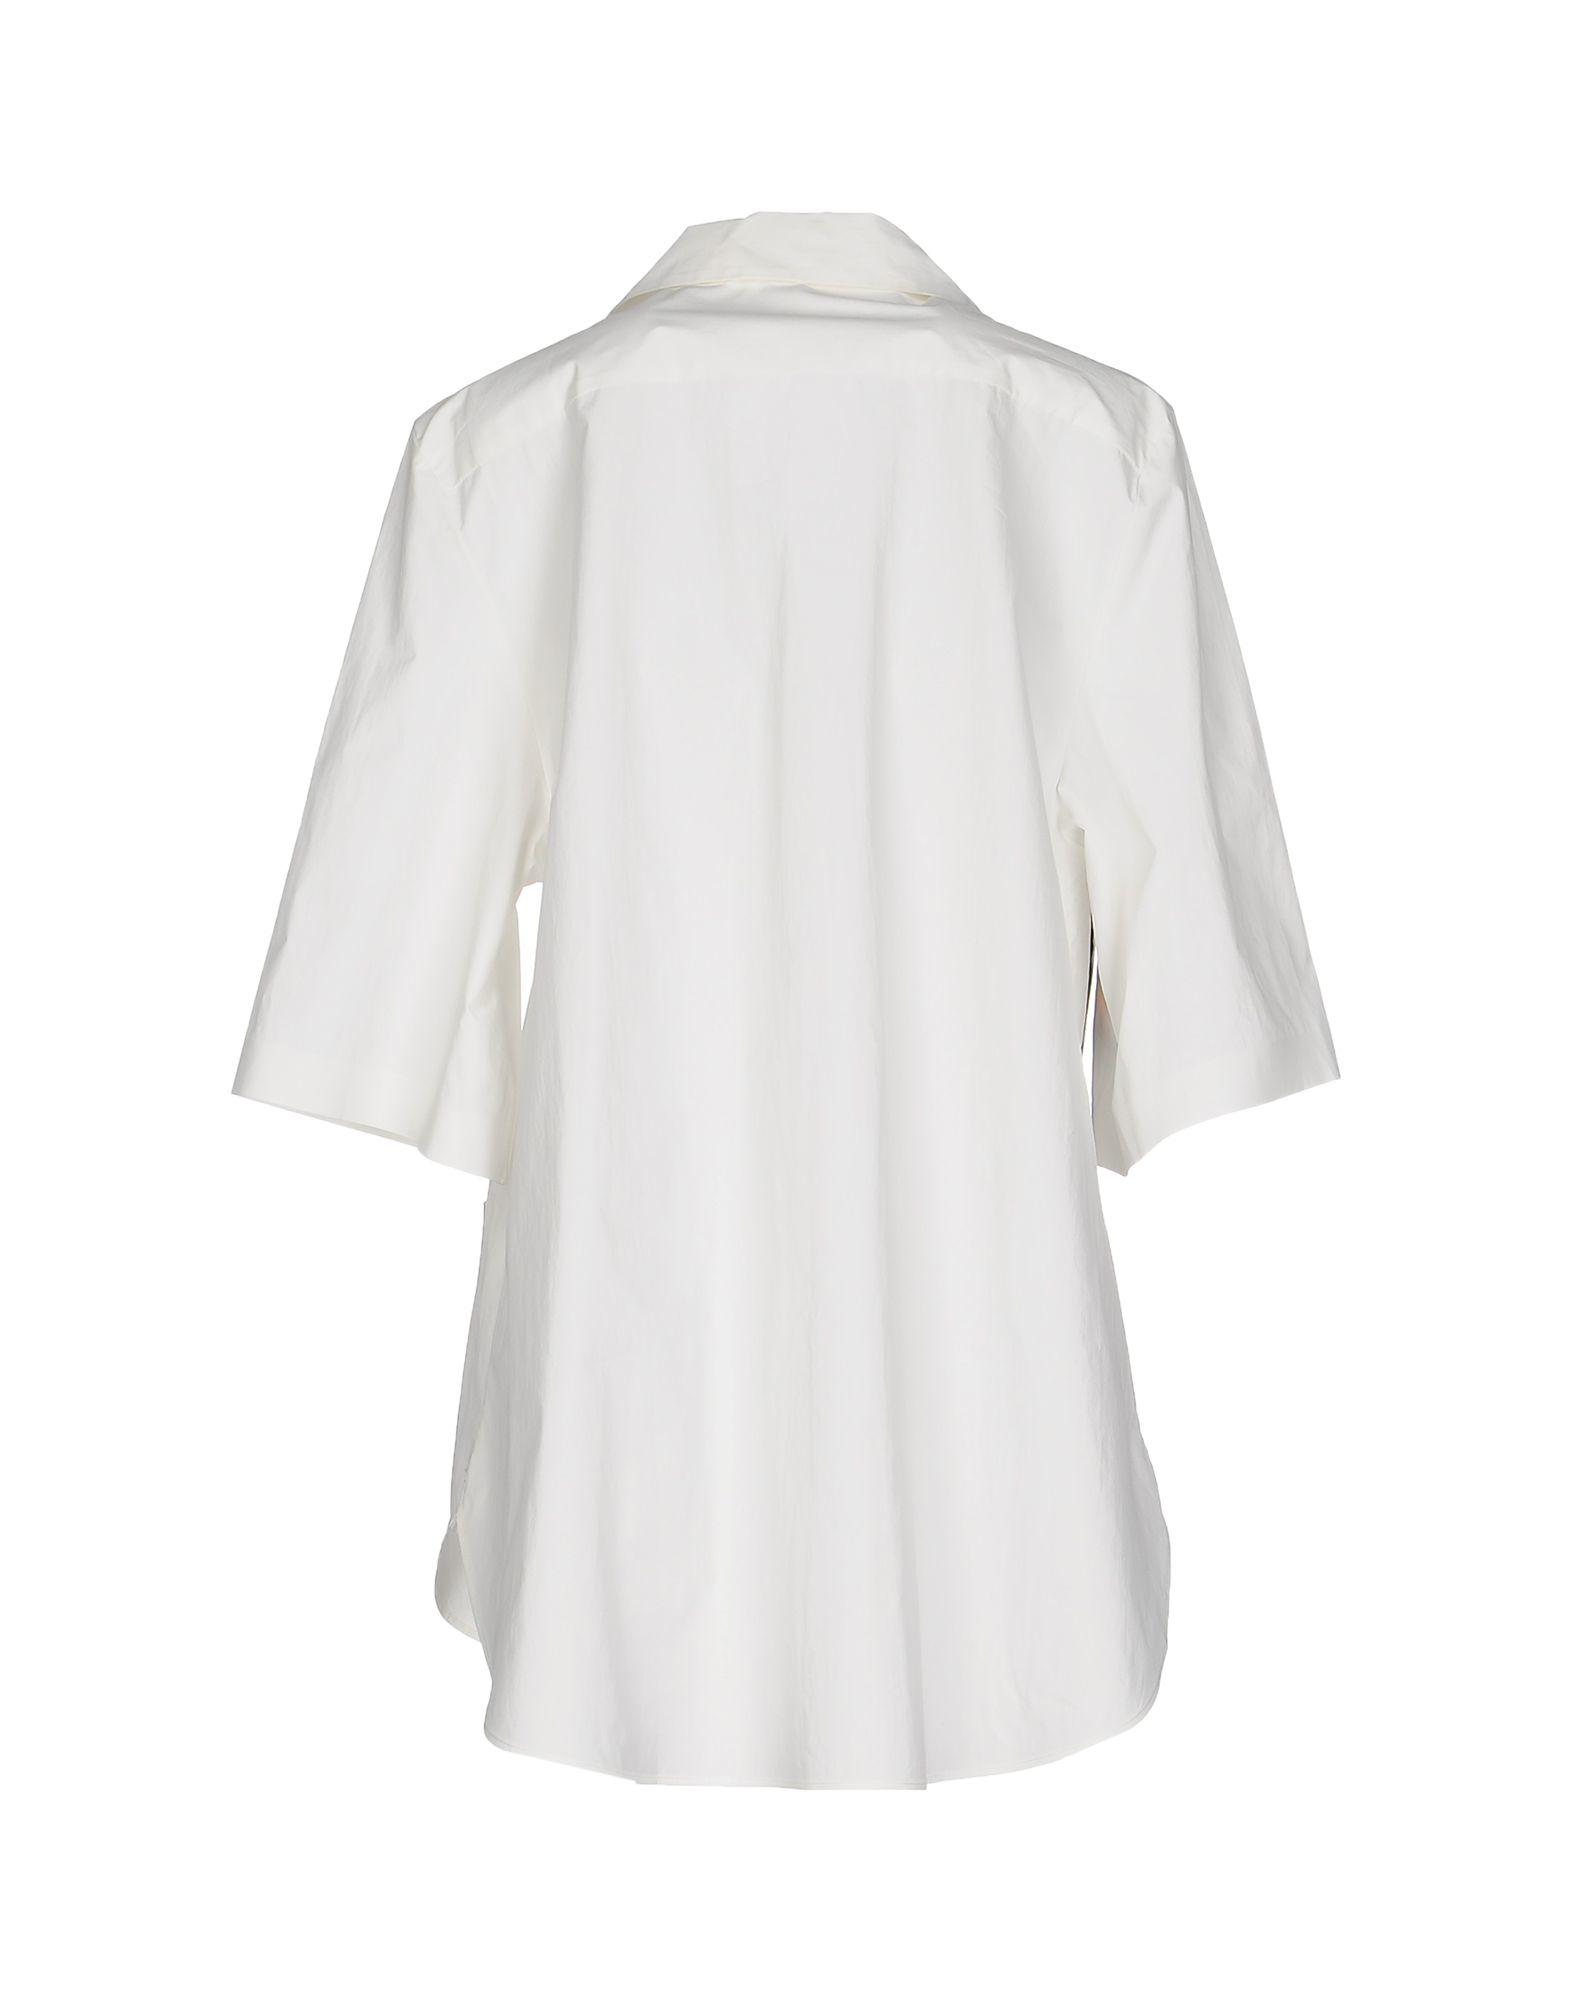 Acne Studios Shirt In White Lyst